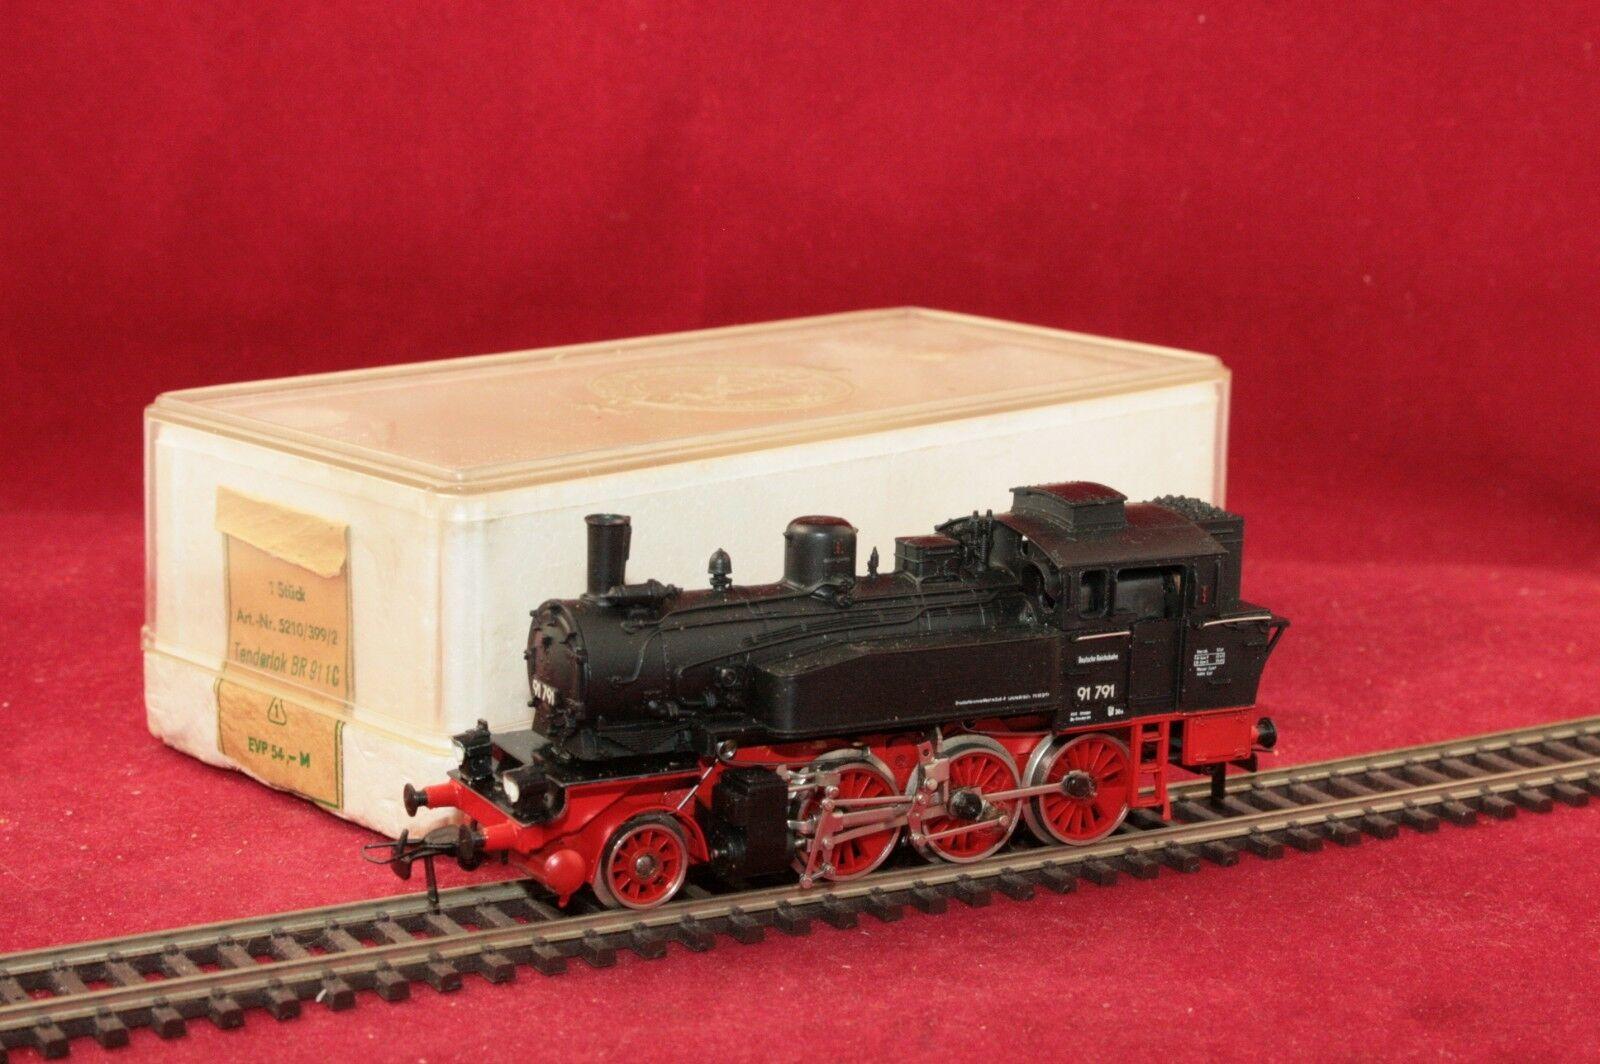 Permot hruska h0 Dr máquina de vapor br 91 791 nero embalaje original muy buen estado